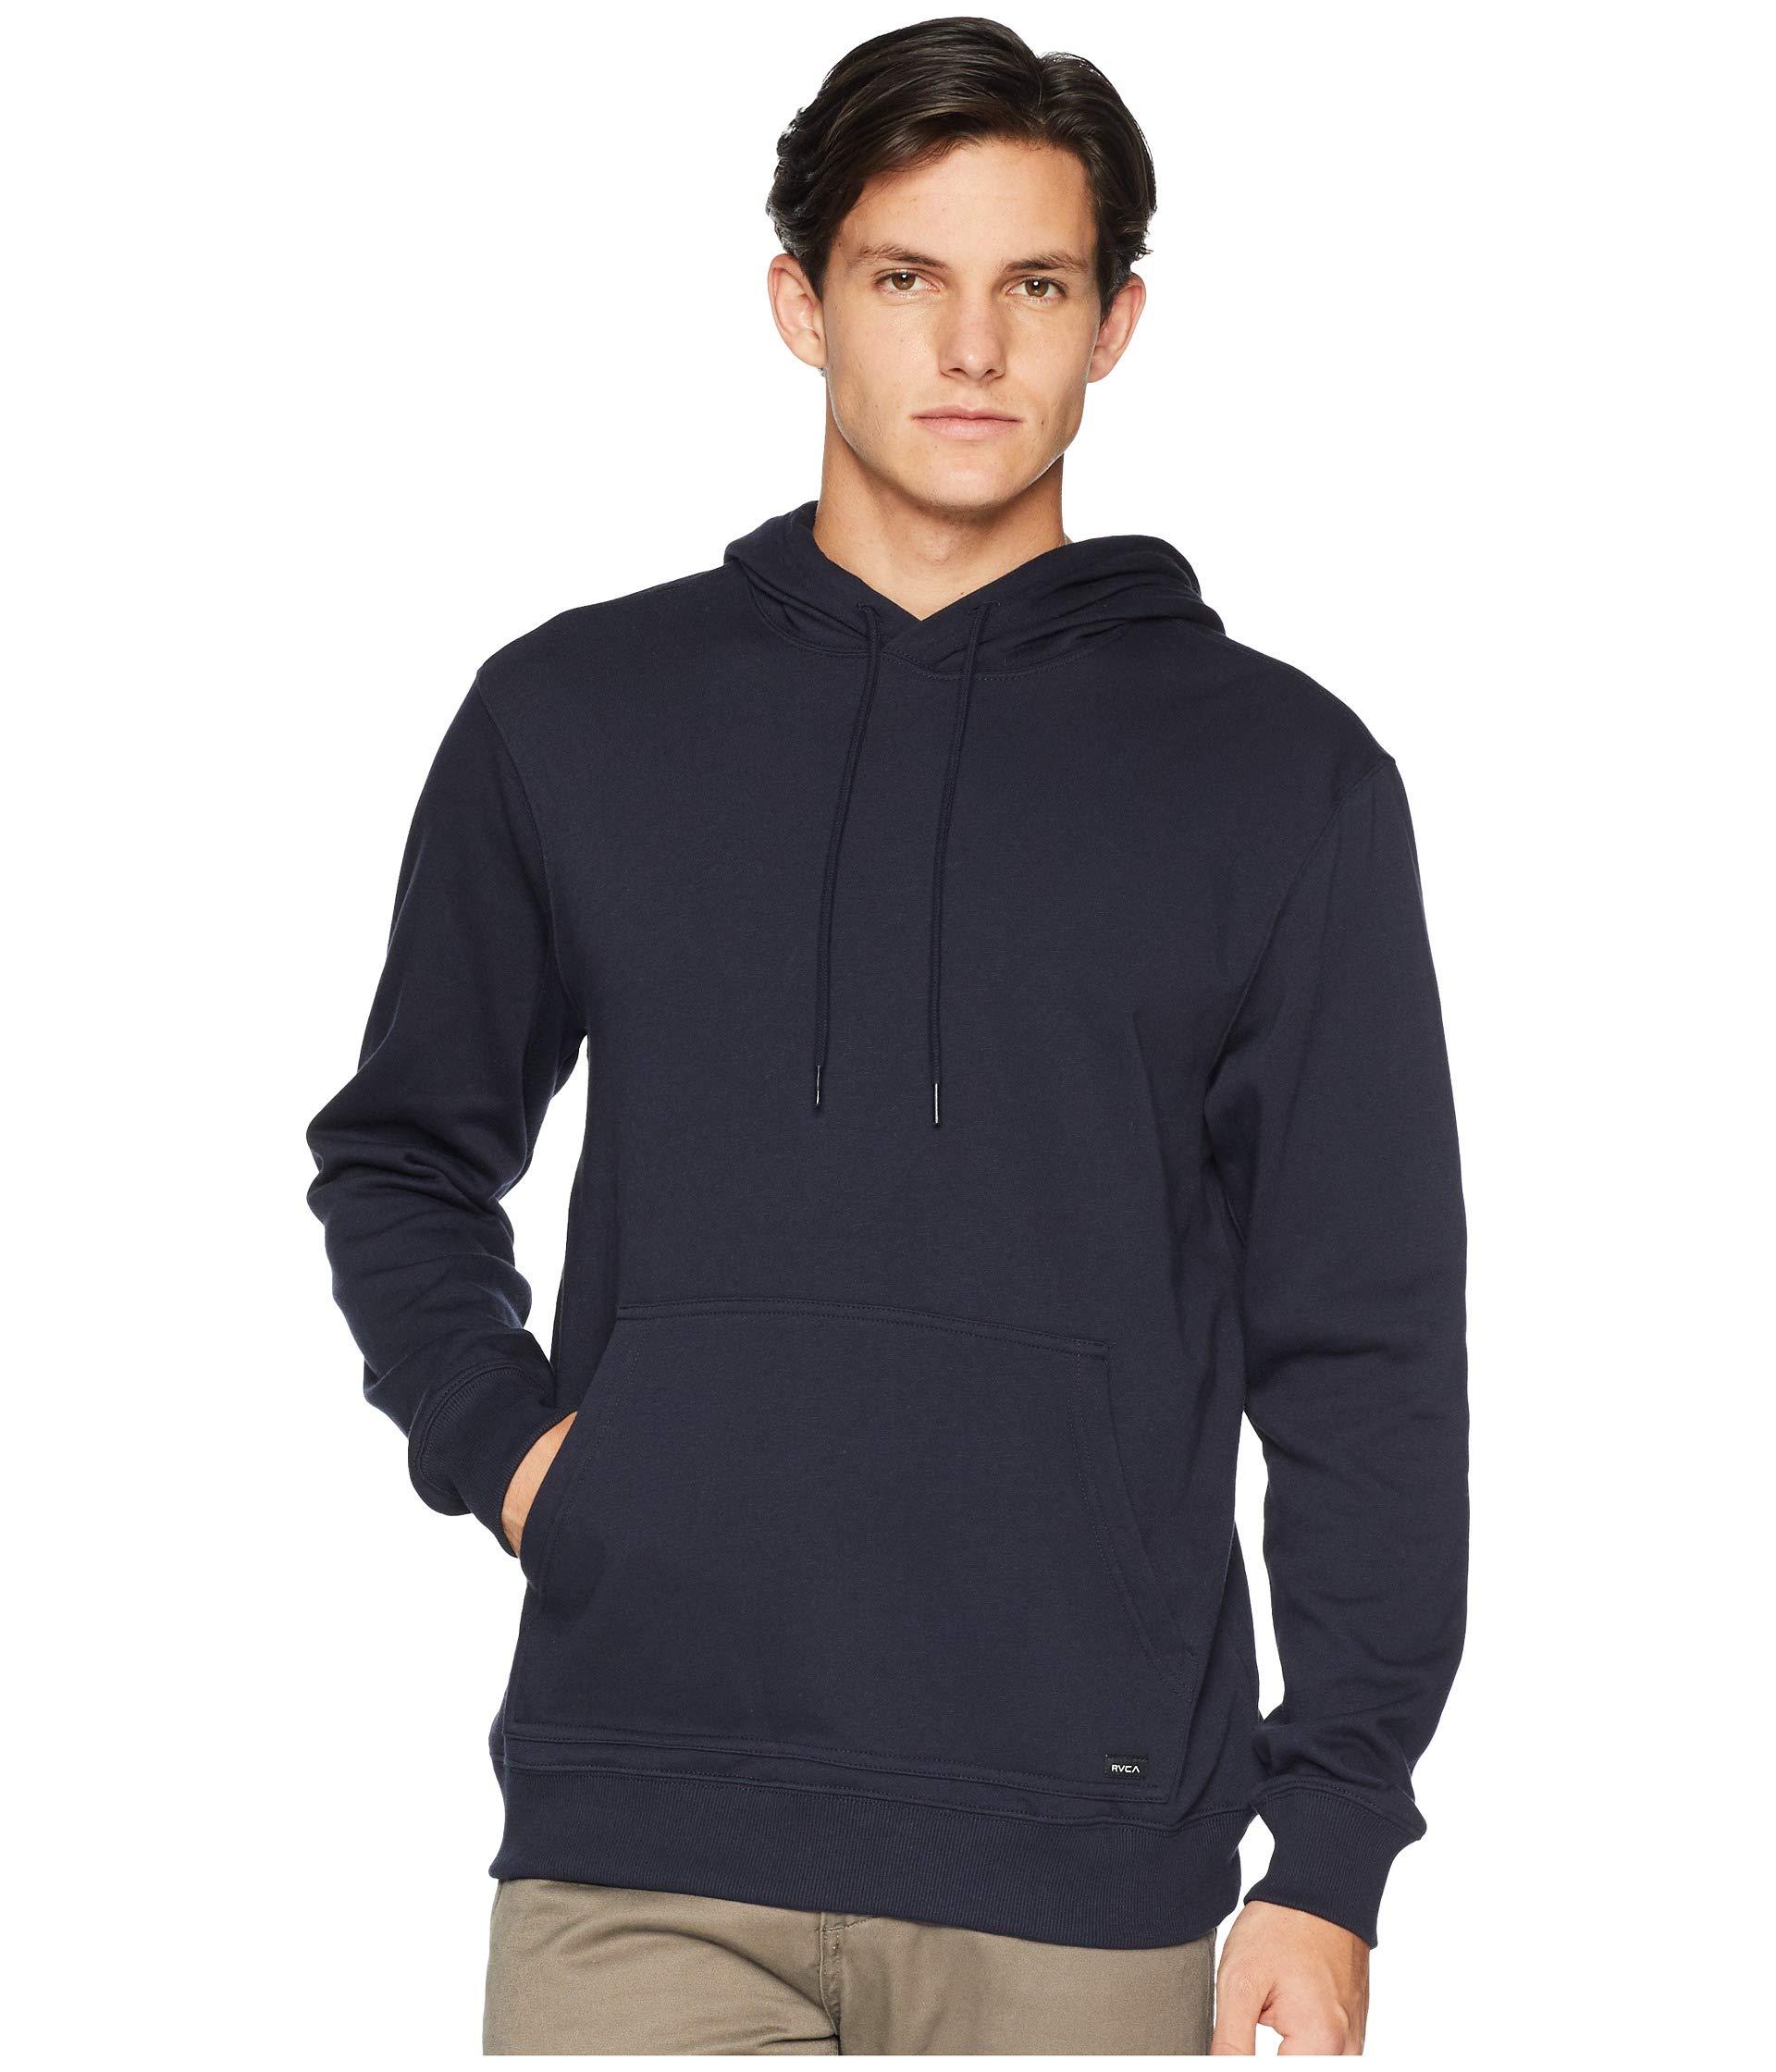 RVCA Men's Dayshift Hooded Fleece Sweatshirt